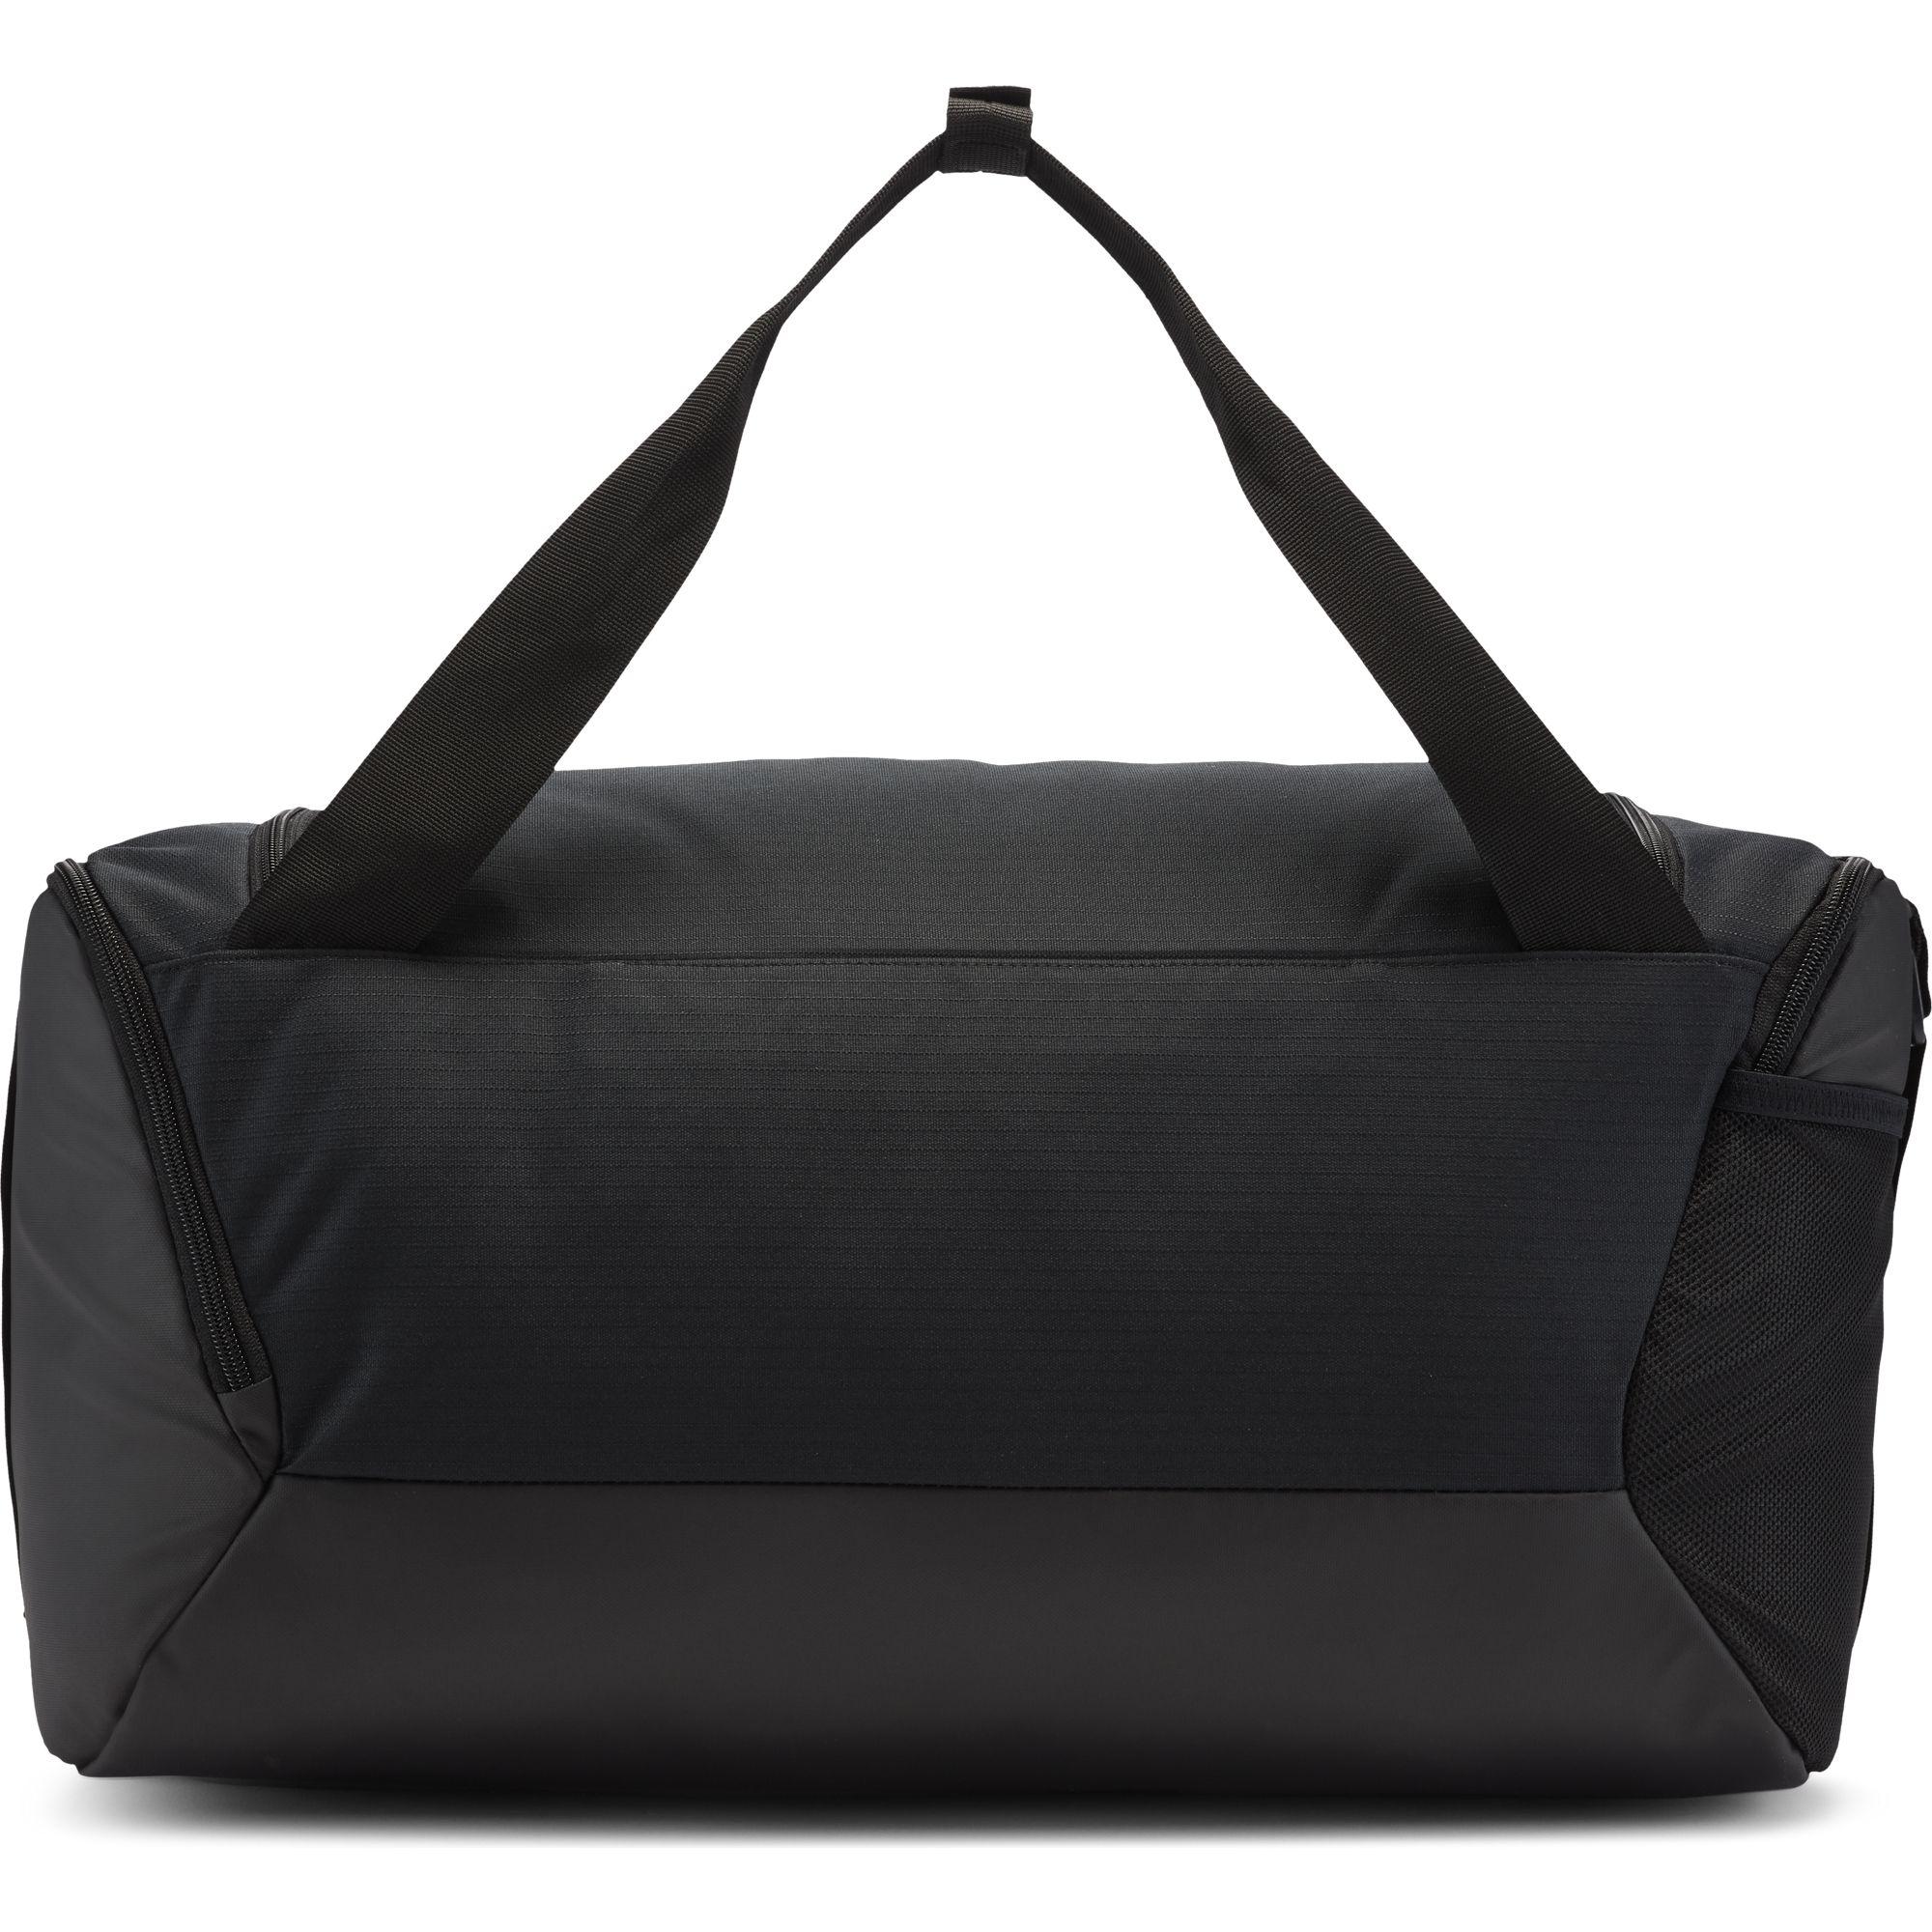 Brasilia Small Training Duffell Bag, Black/Red, swatch